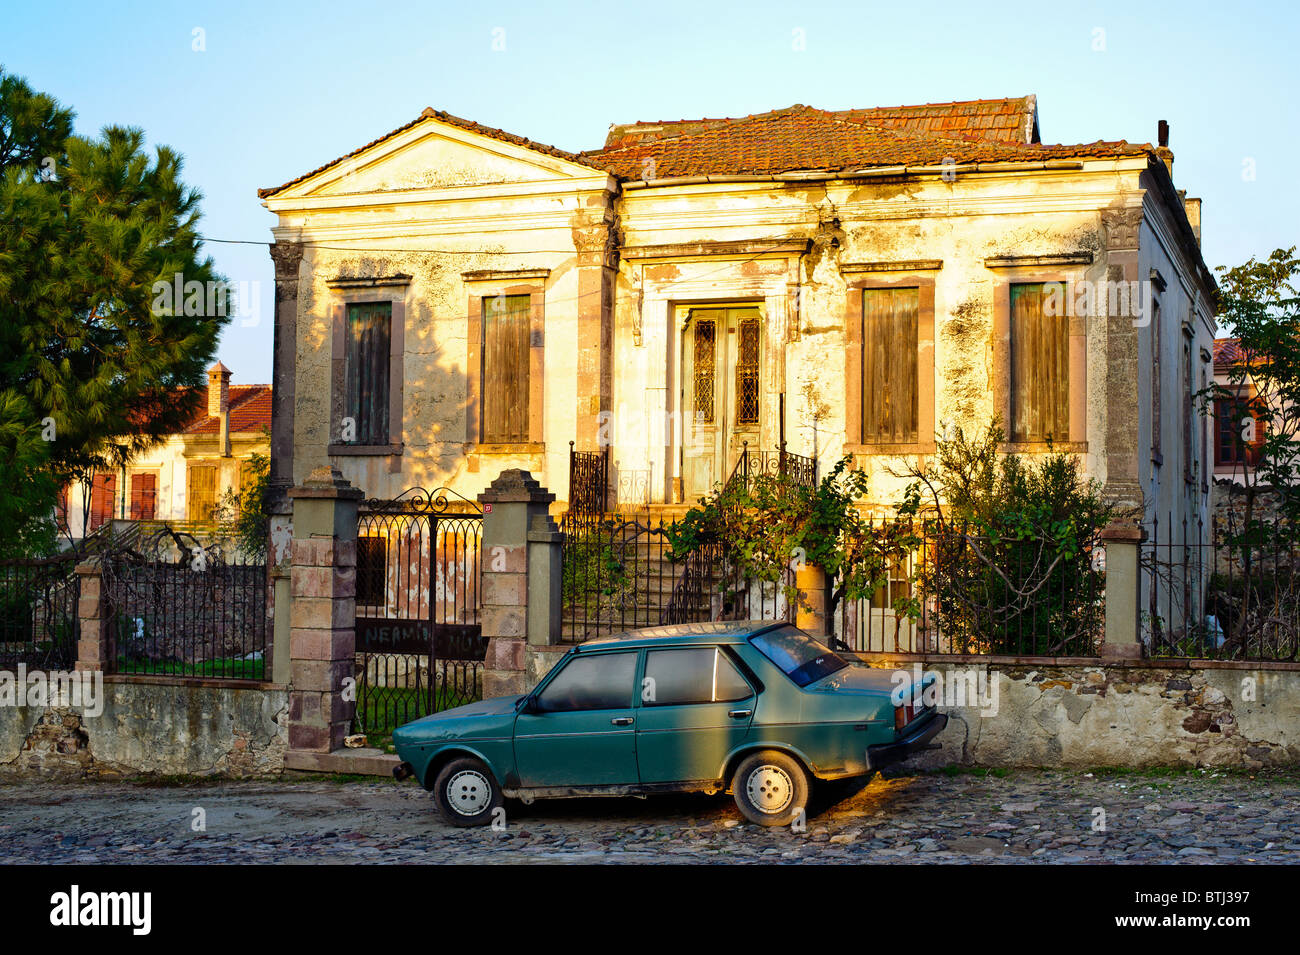 Greek house and Turkish car, Cunda Island, near Ayvalik, Turkey. - Stock Image